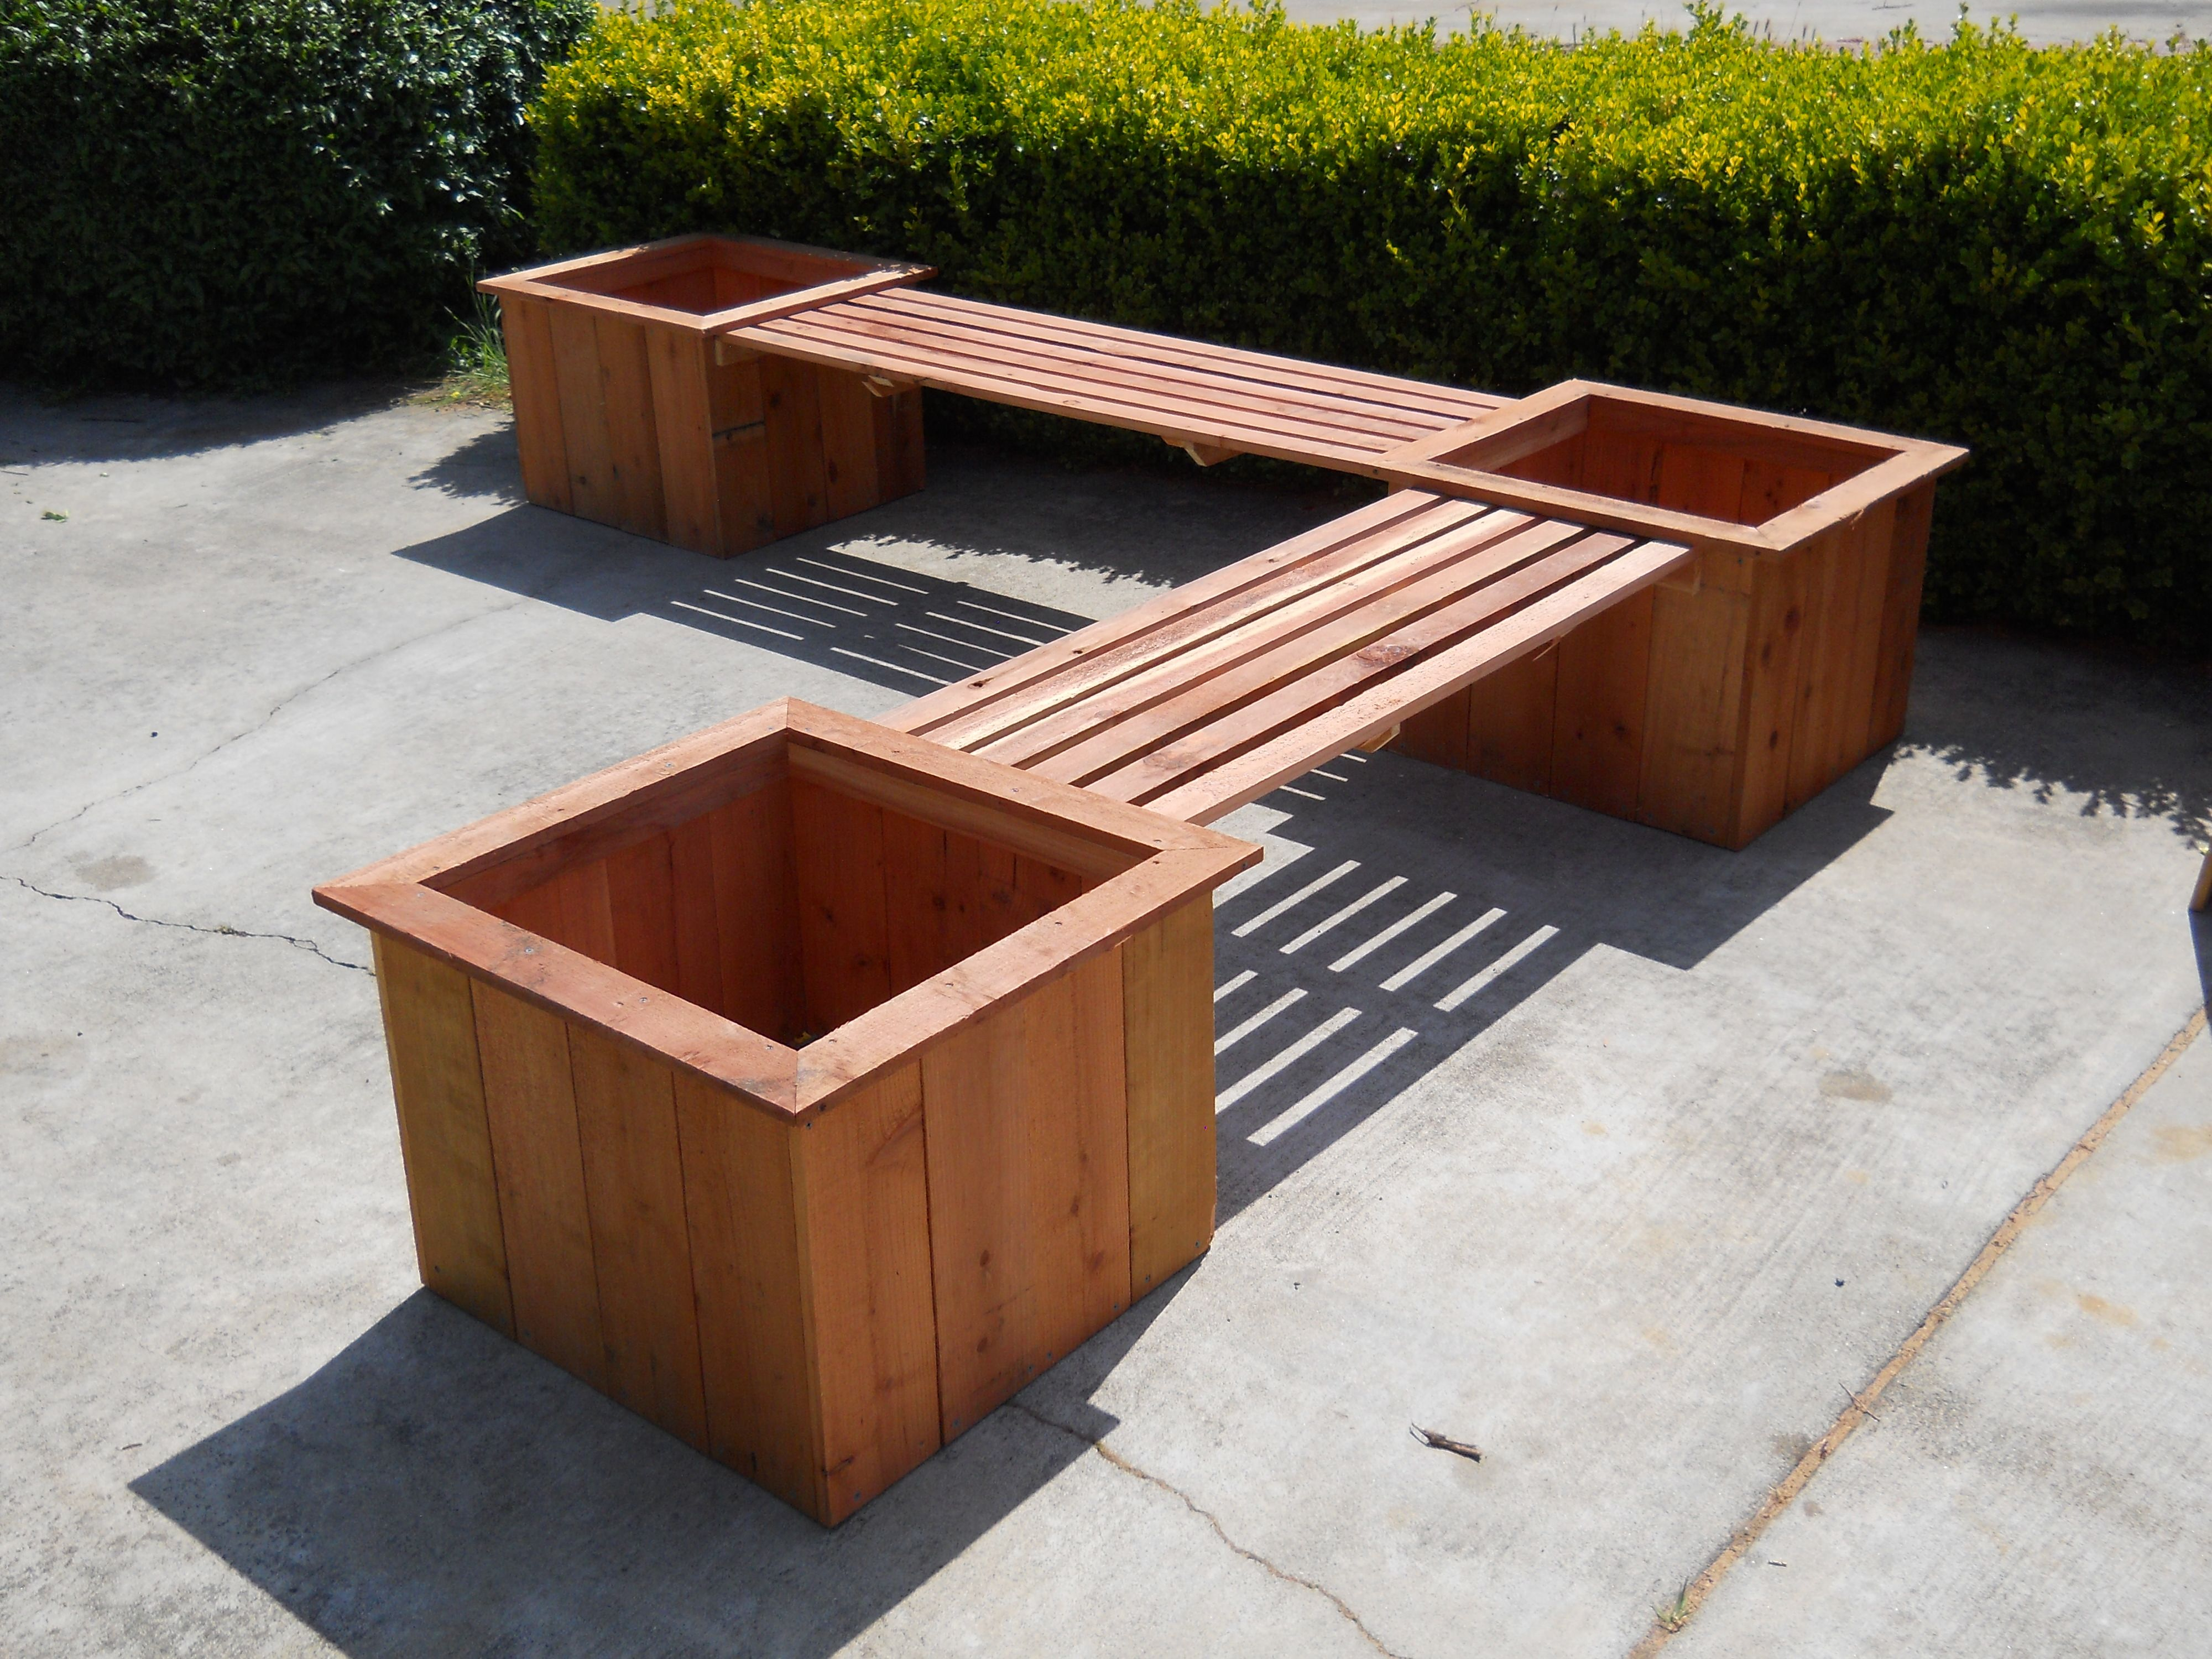 Custom Planters Diy wood planters, Deck planters, Diy